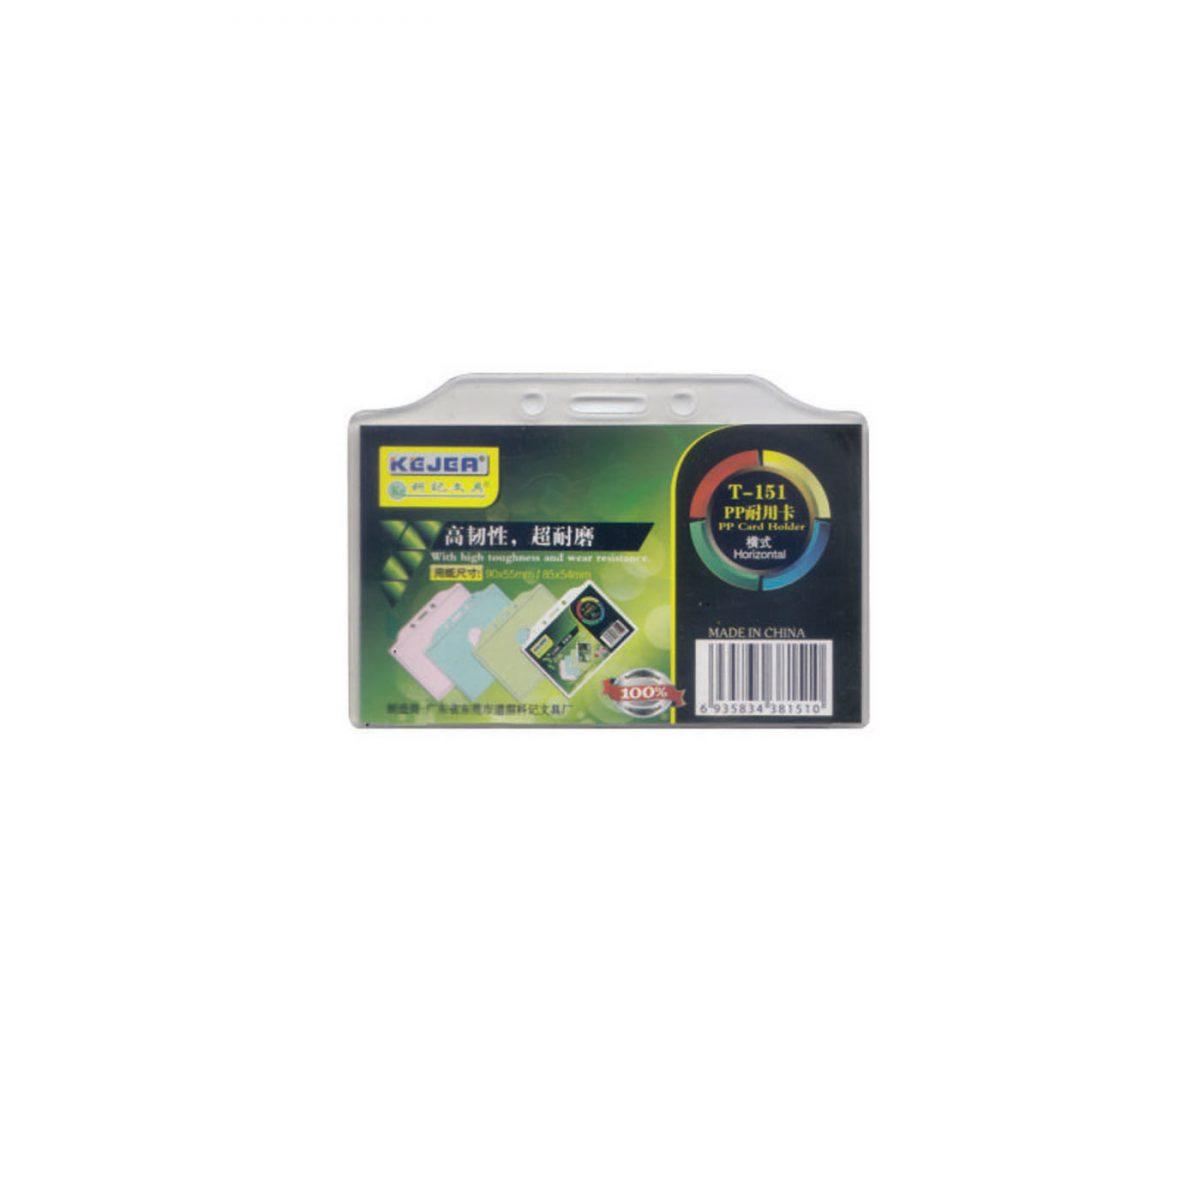 Suport carduri orizontal, 90x55 mm KEJEA T-151H, 10 buc/set